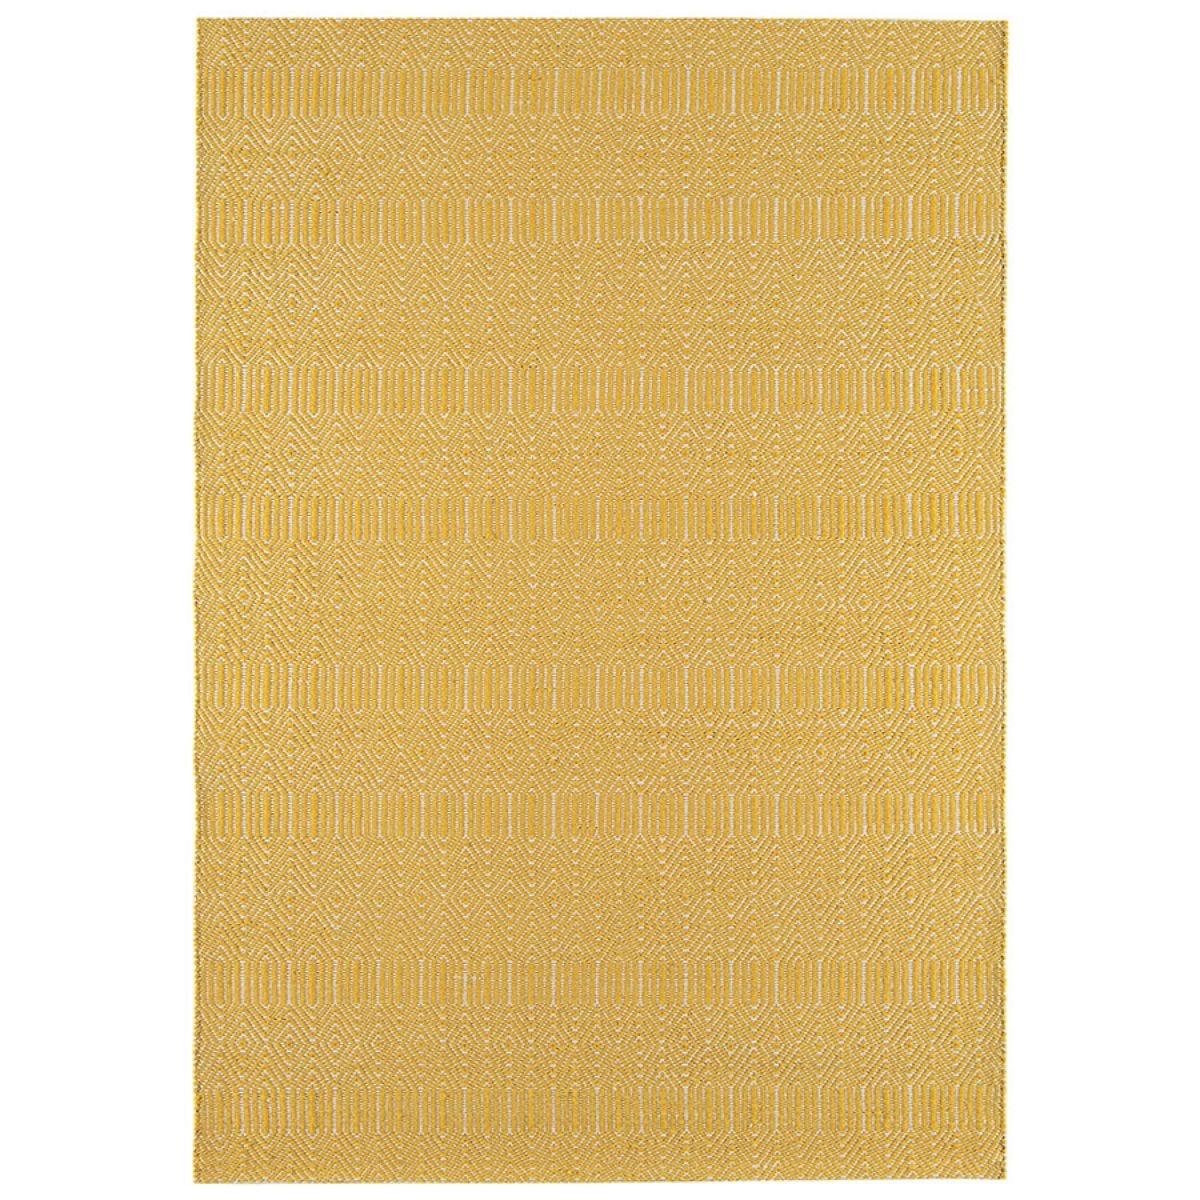 Asiatic Sloan Rug, 66 x 200cm - Mustard